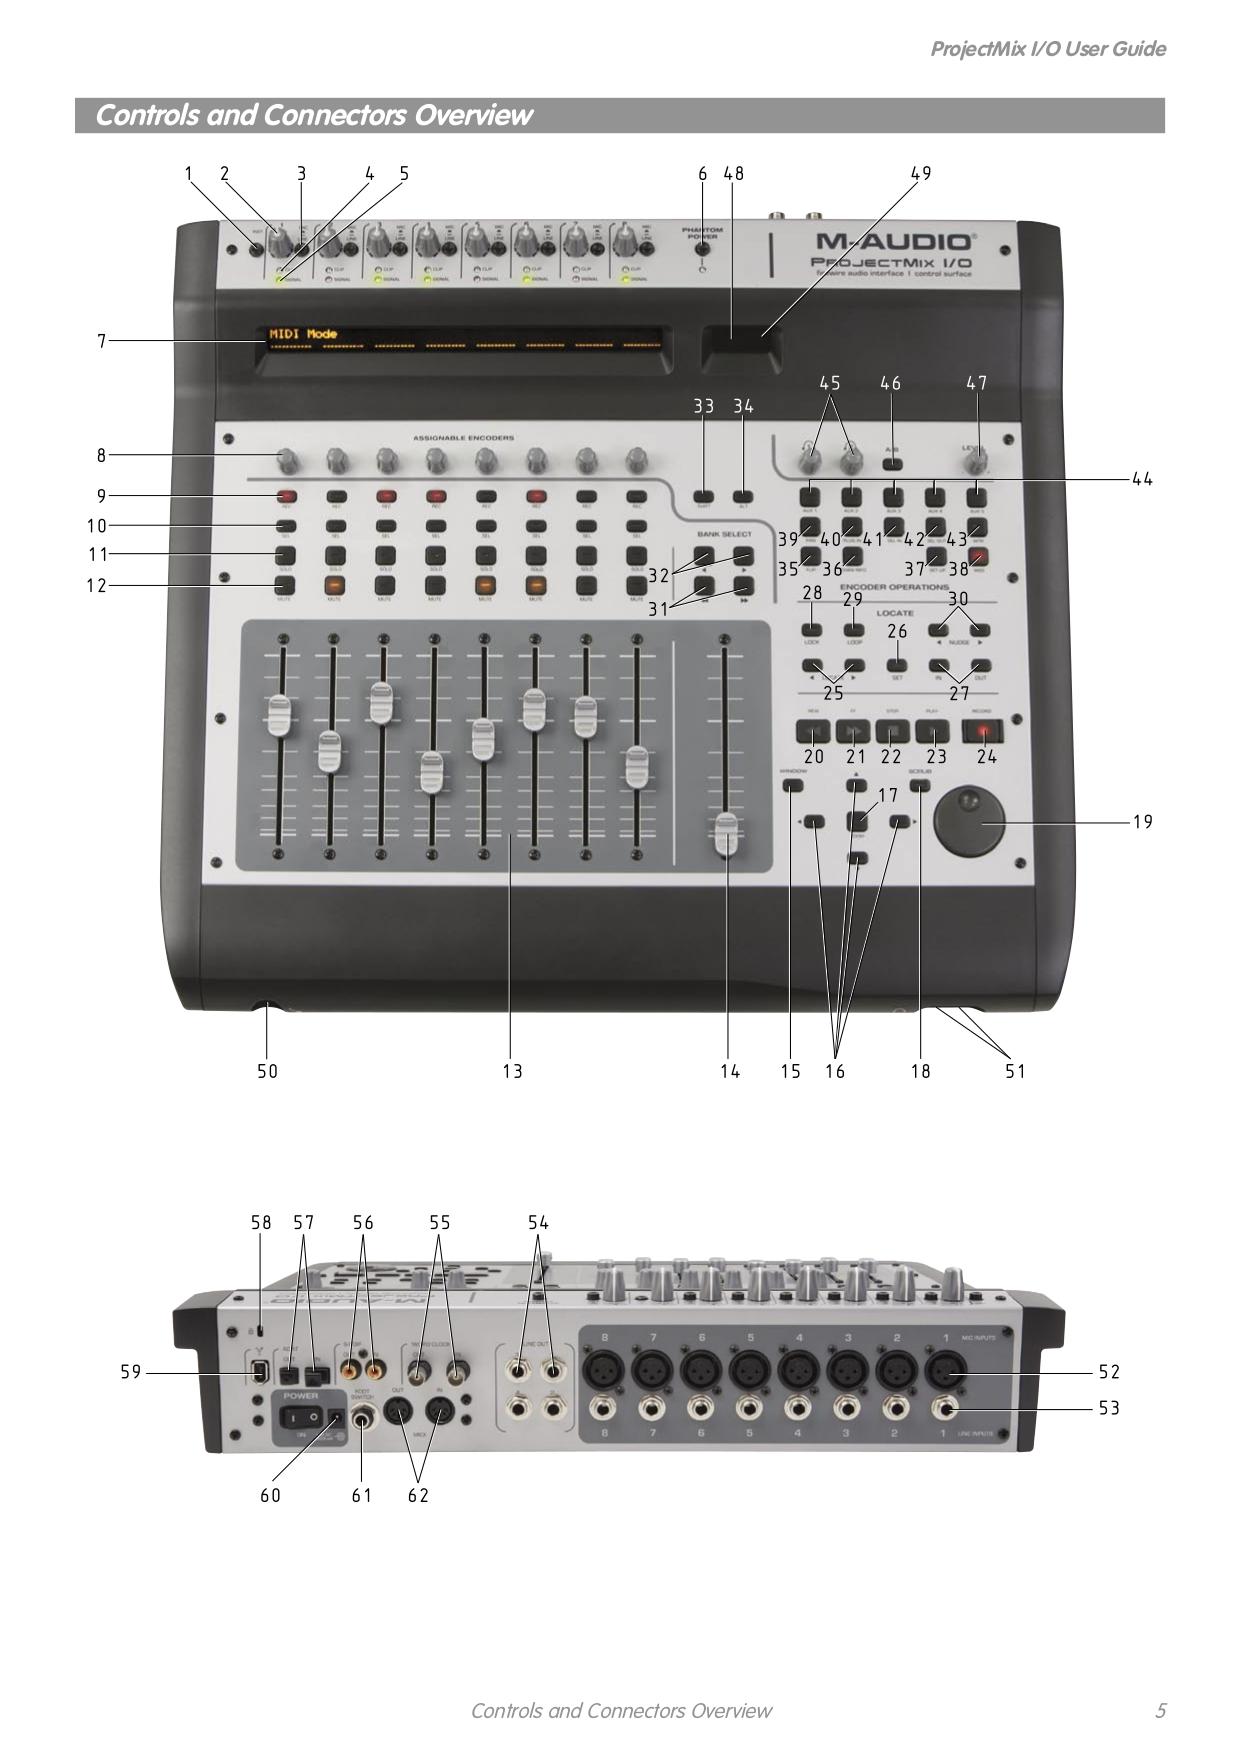 pdf manual for mackie amp fr series m 1400 rh umlib com m-audio projectmix i/o manual M-Audio Project Mix Windows 8